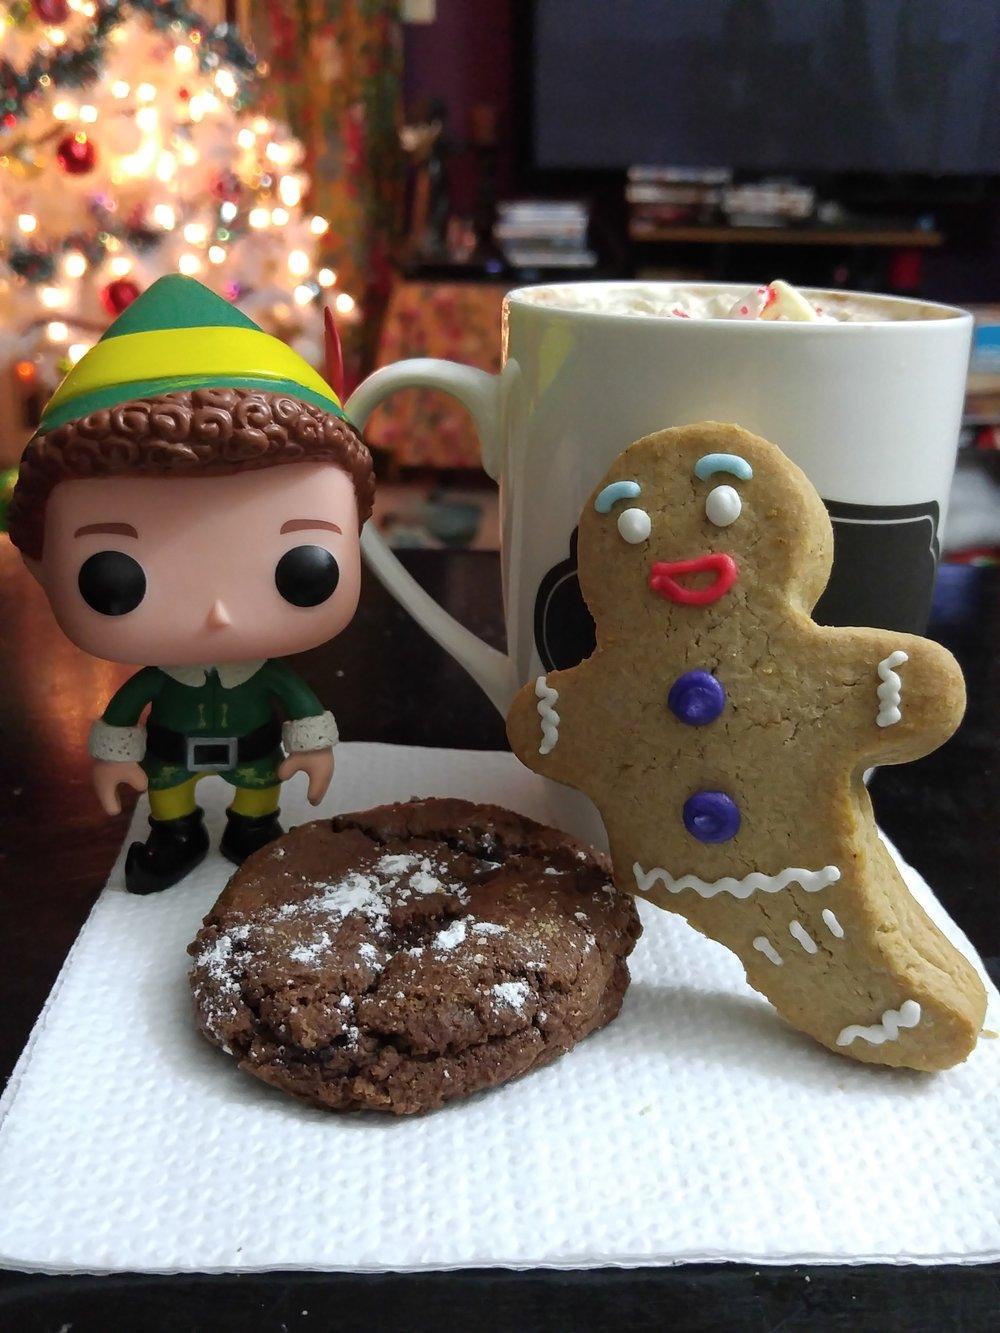 Brownie Cookie with Buddy & Gingie